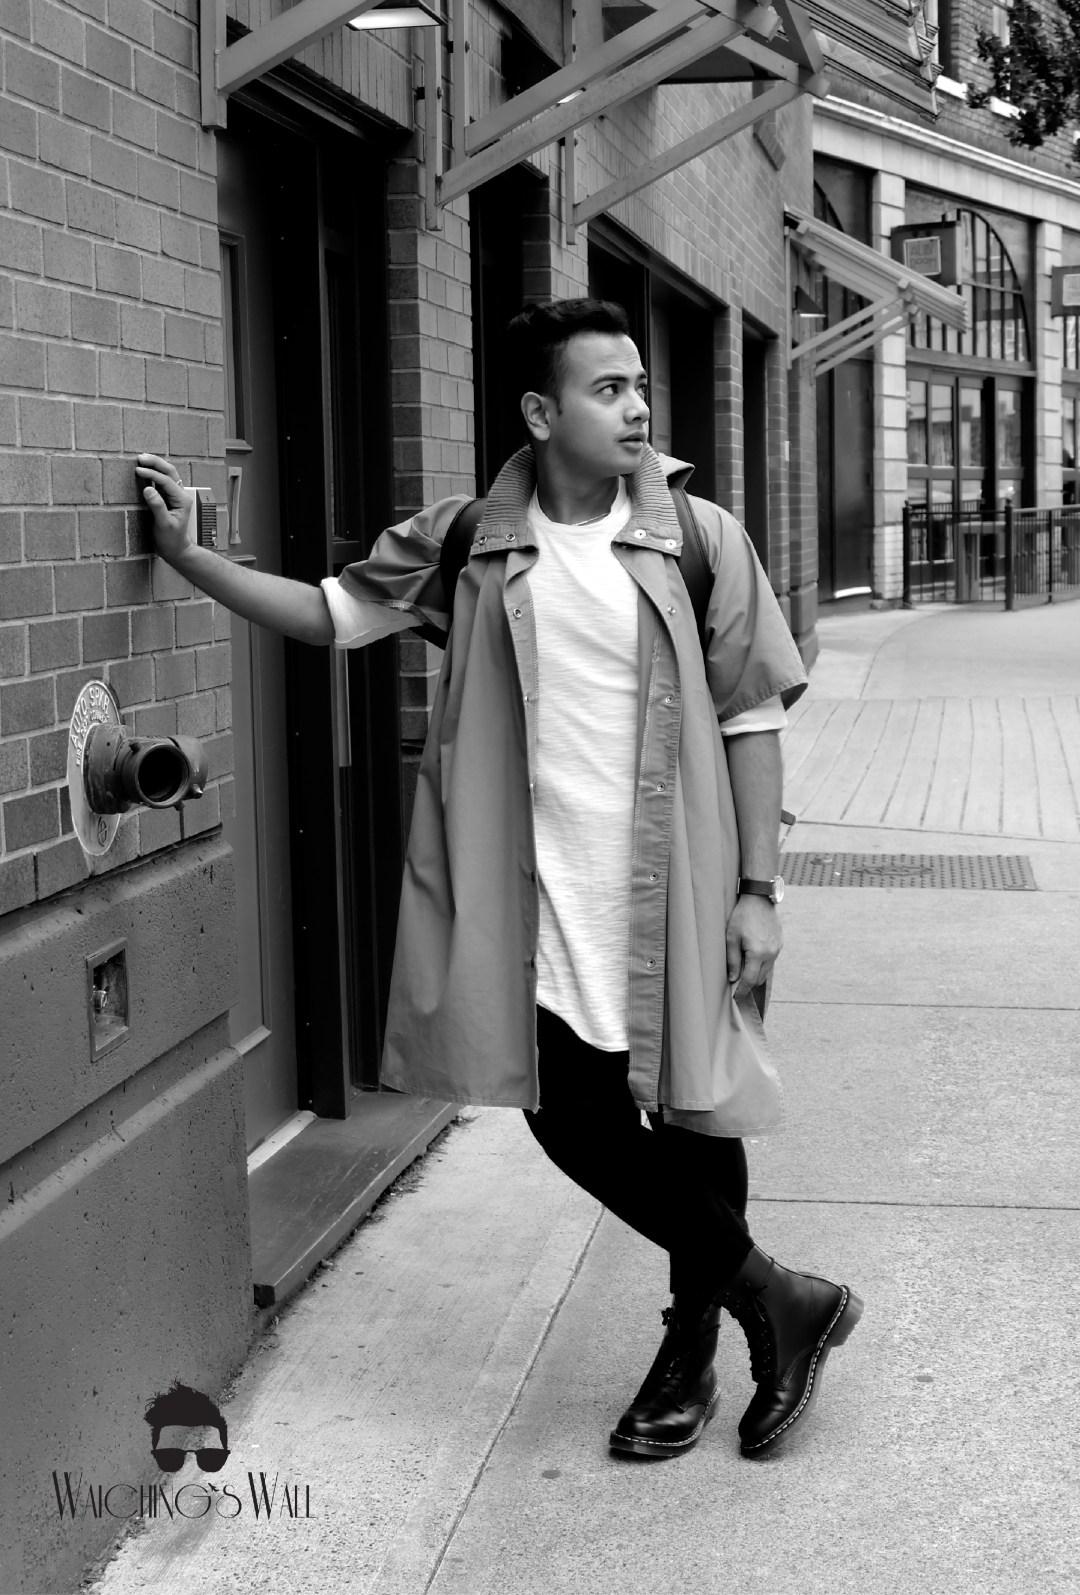 jonathan-waiching-ho_premium-mens-fashion-blogger-vancouver-canda_waichings-wall-06